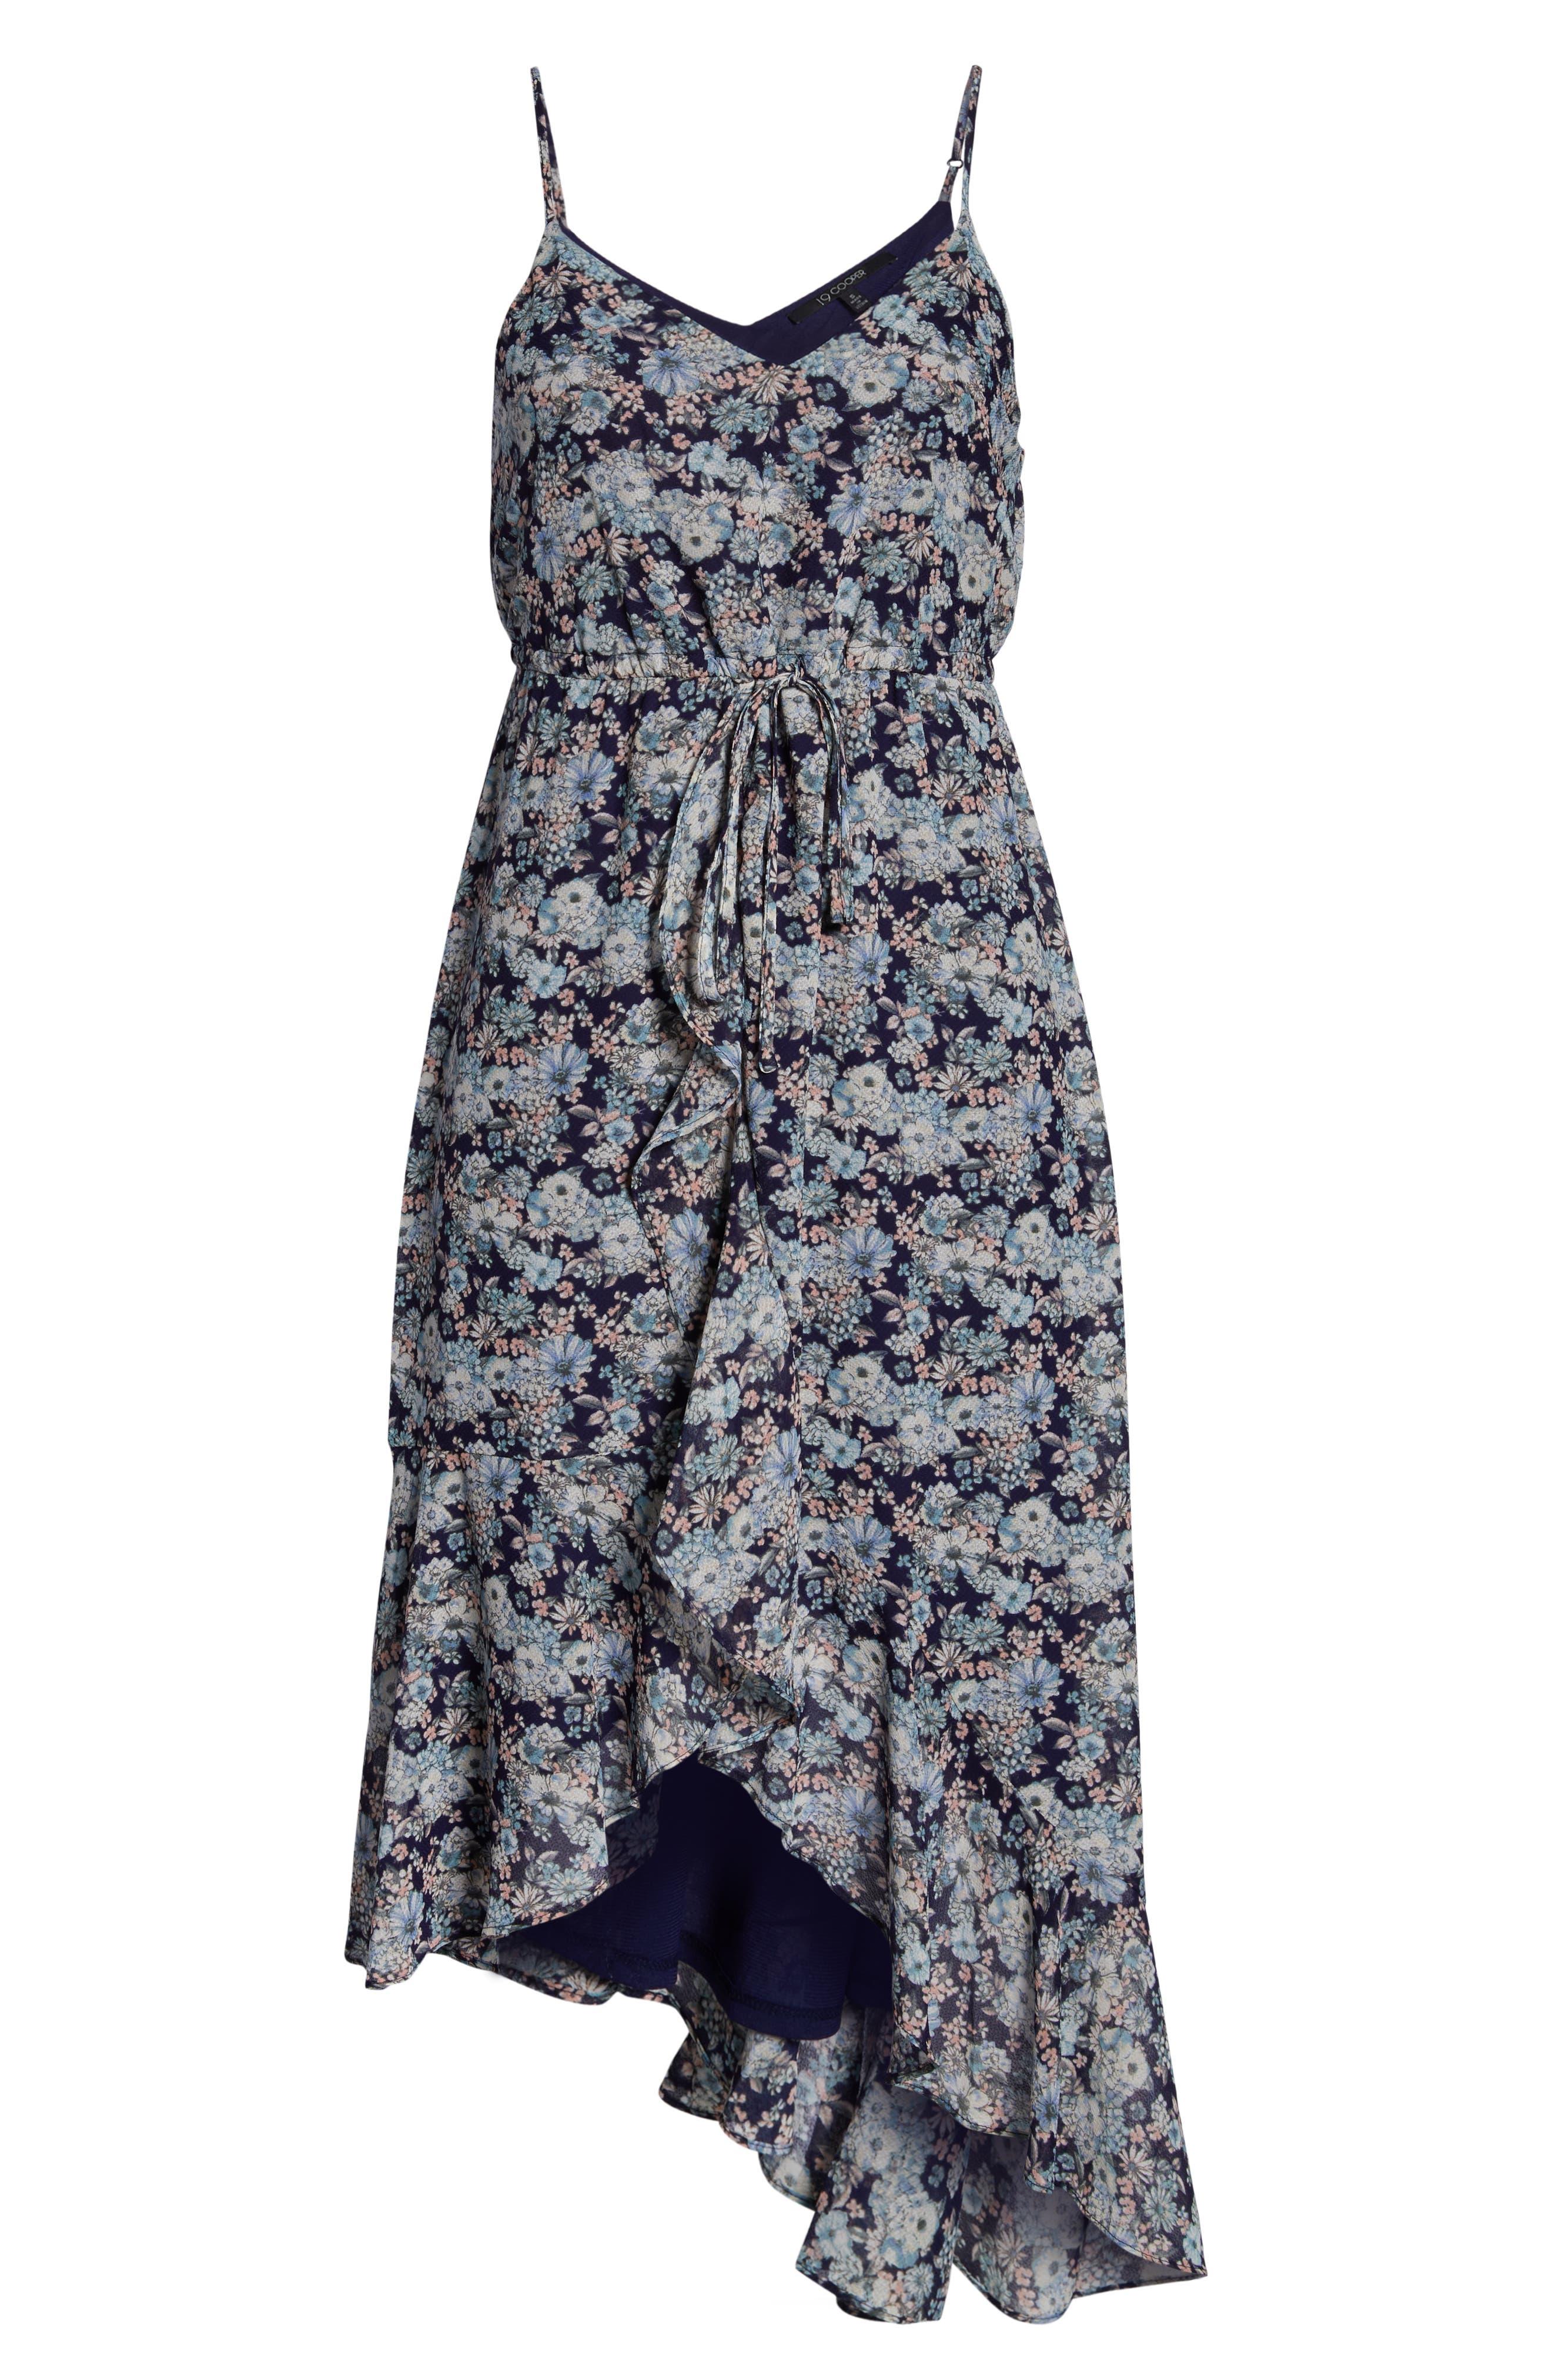 19 COOPER, Asymmetrical Ruffle Hem Dress, Alternate thumbnail 7, color, 410